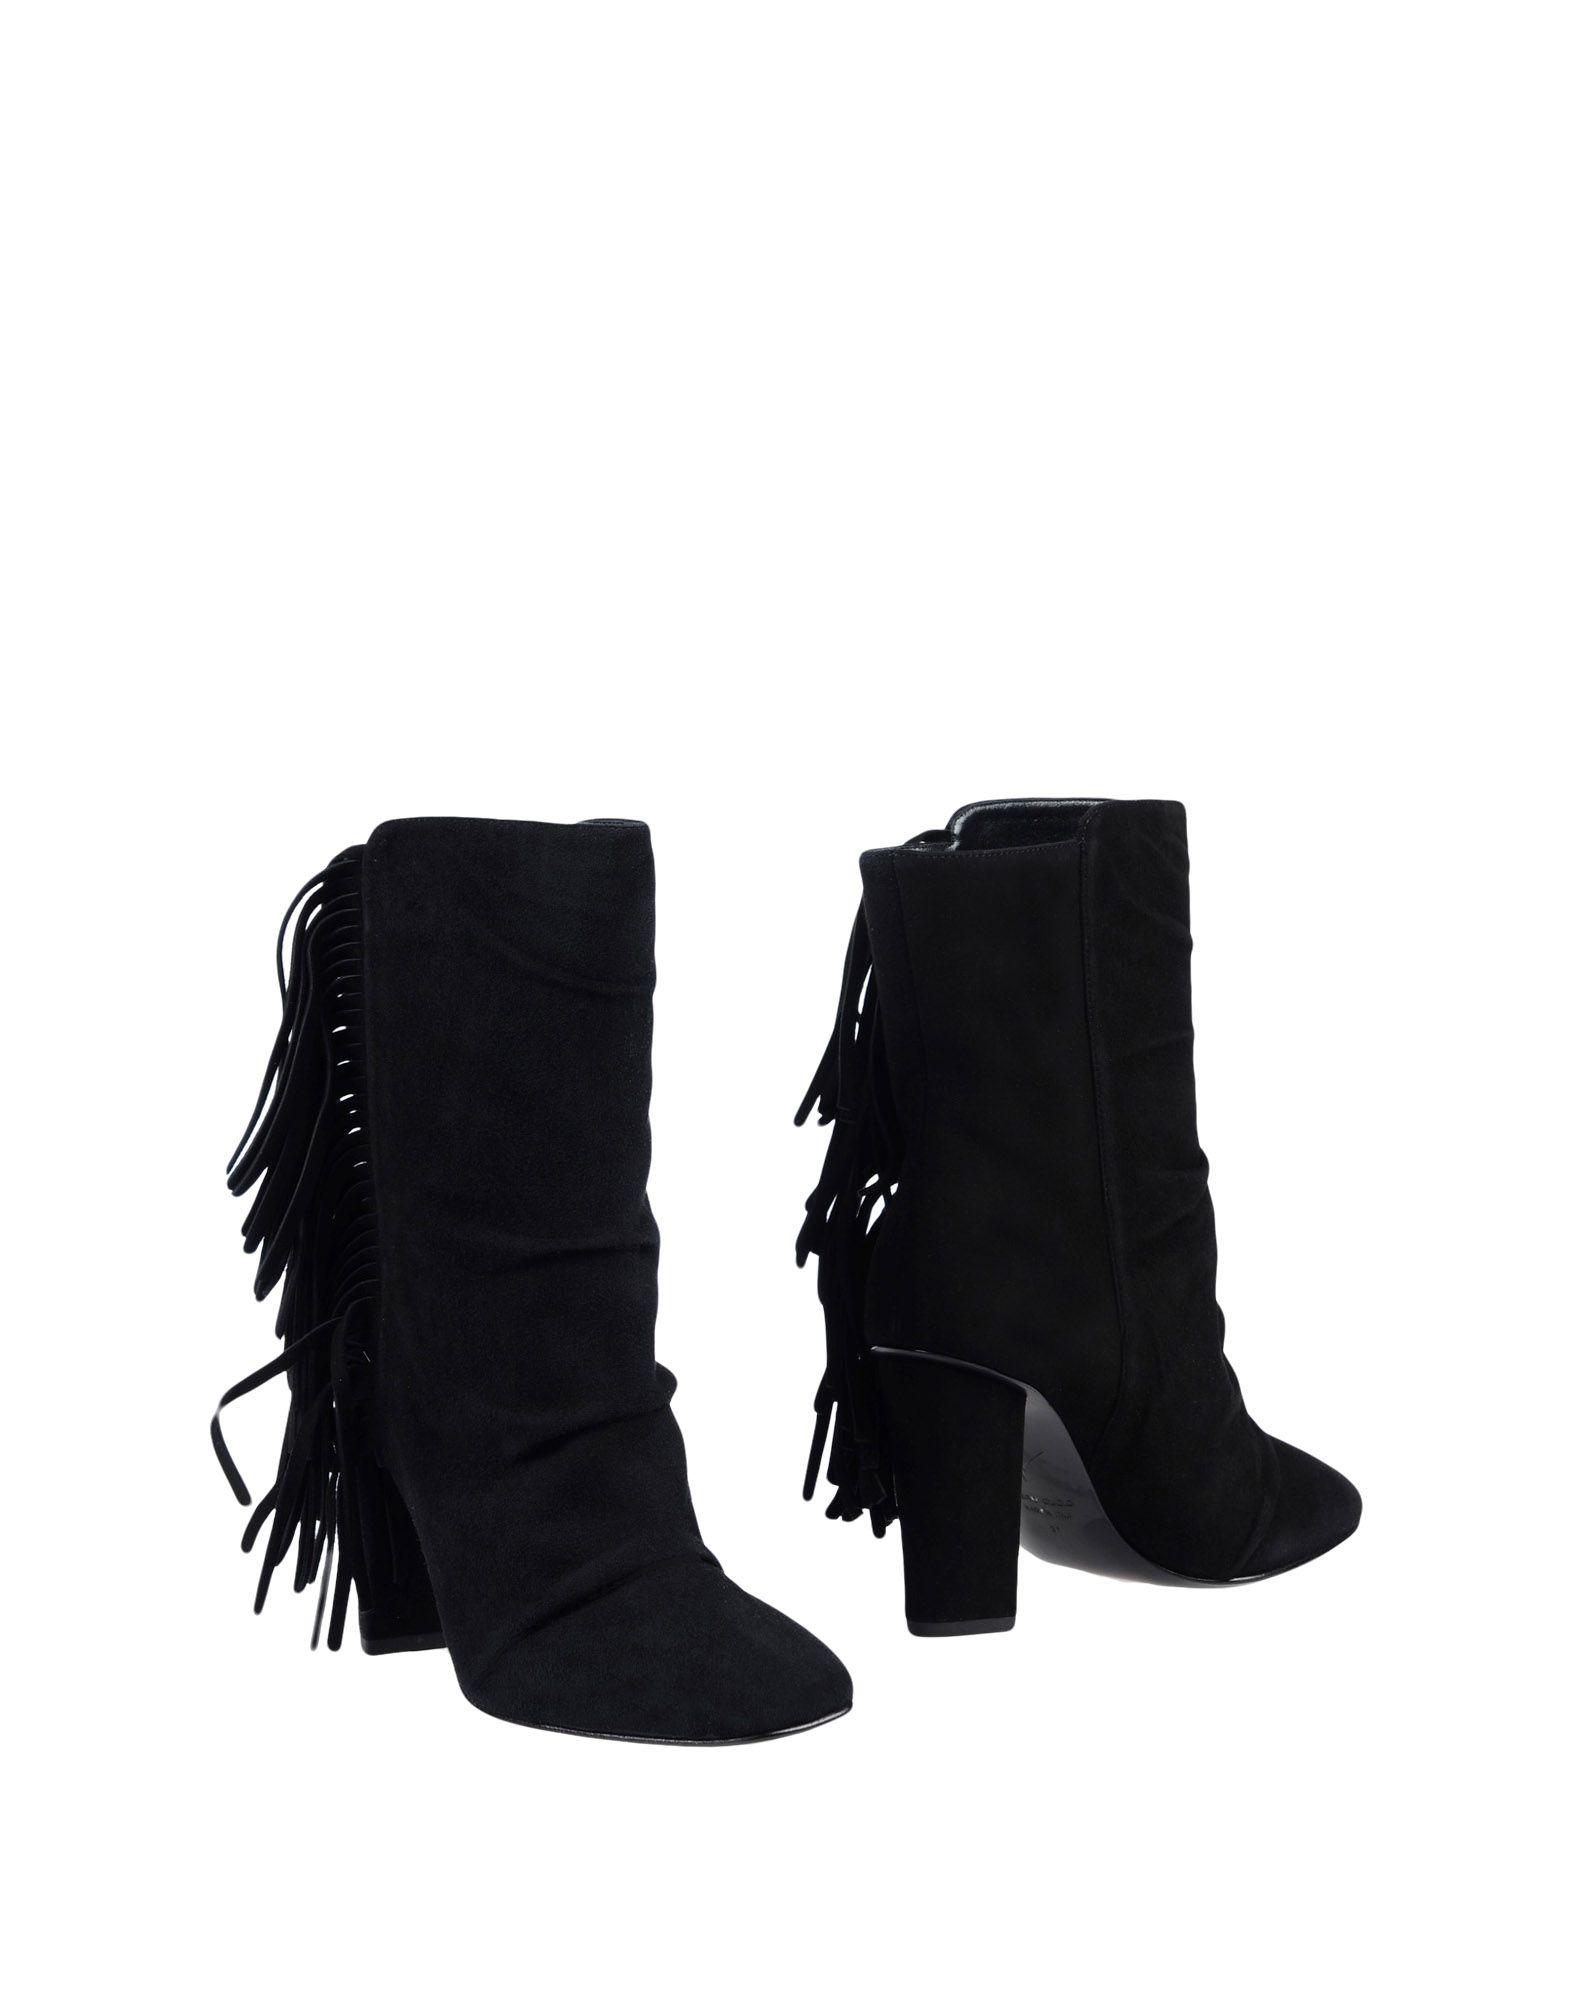 Giuseppe Zanotti Stiefelette Damen  11195920JA Beliebte Schuhe